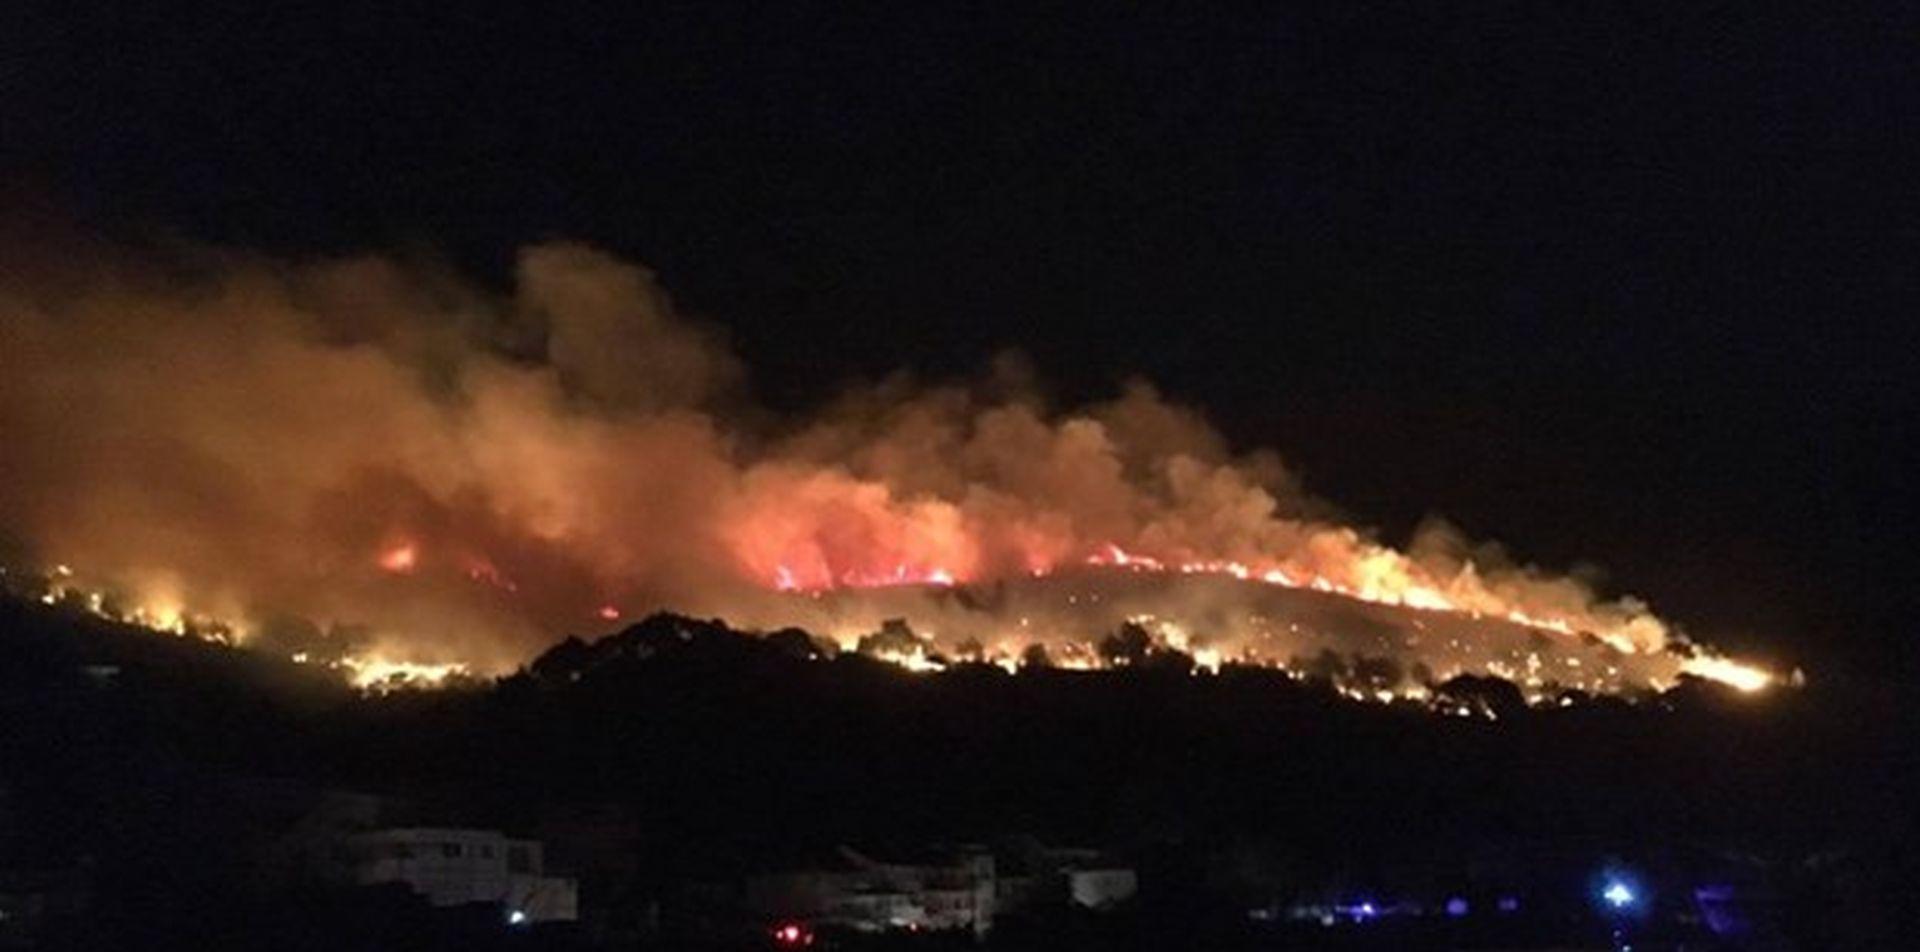 VIDEO: Buknuo veliki požar na Krilu Jesenice, vatrogasci krote vatrenu neman